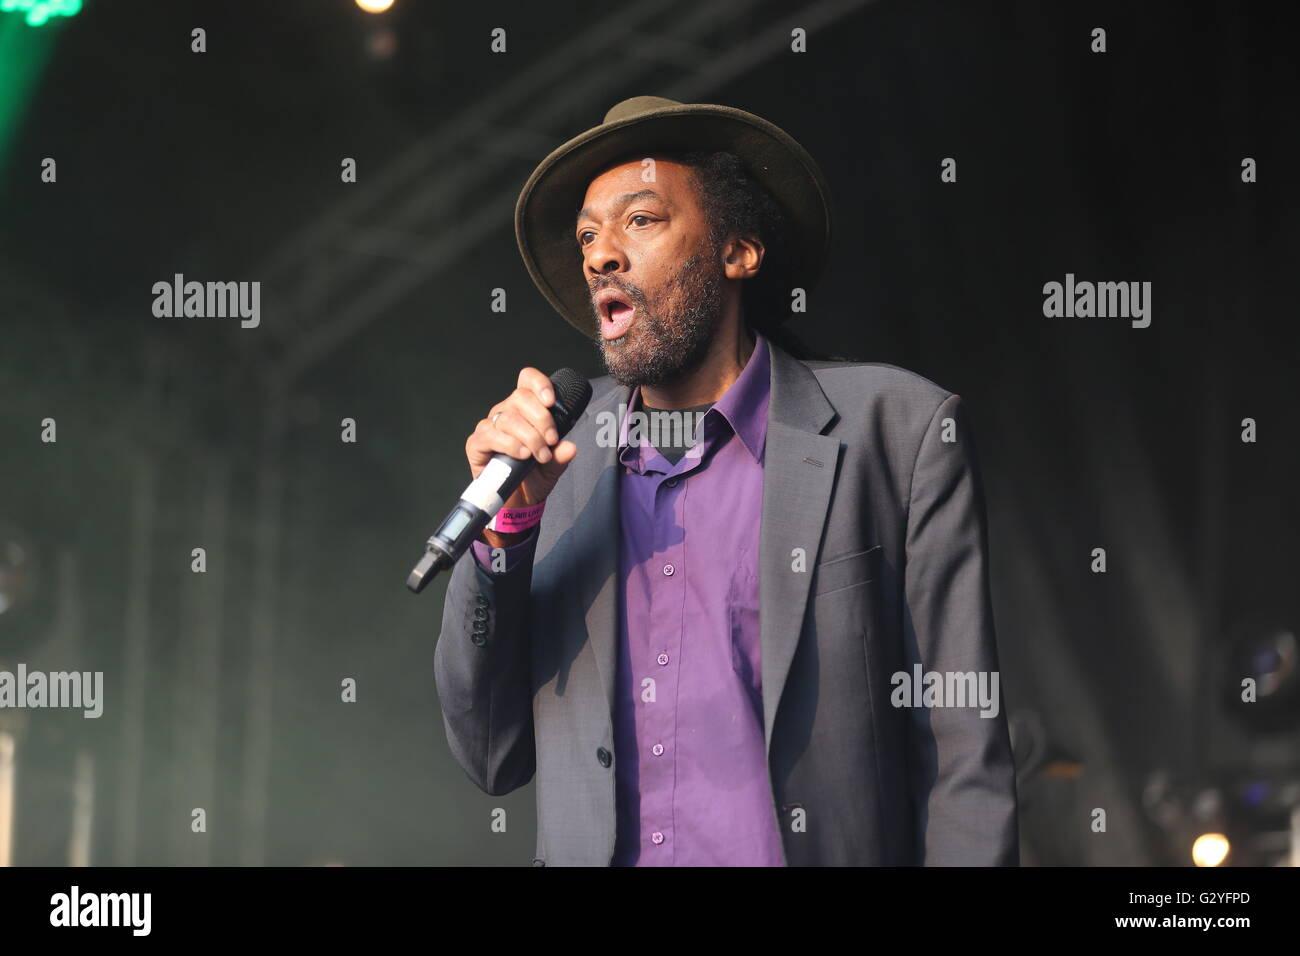 Irlam, Manchester, UK. 4th June, 2016. Aswad perform live at Irlam Live 2016. Credit:  Simon Newbury/Alamy Live - Stock Image